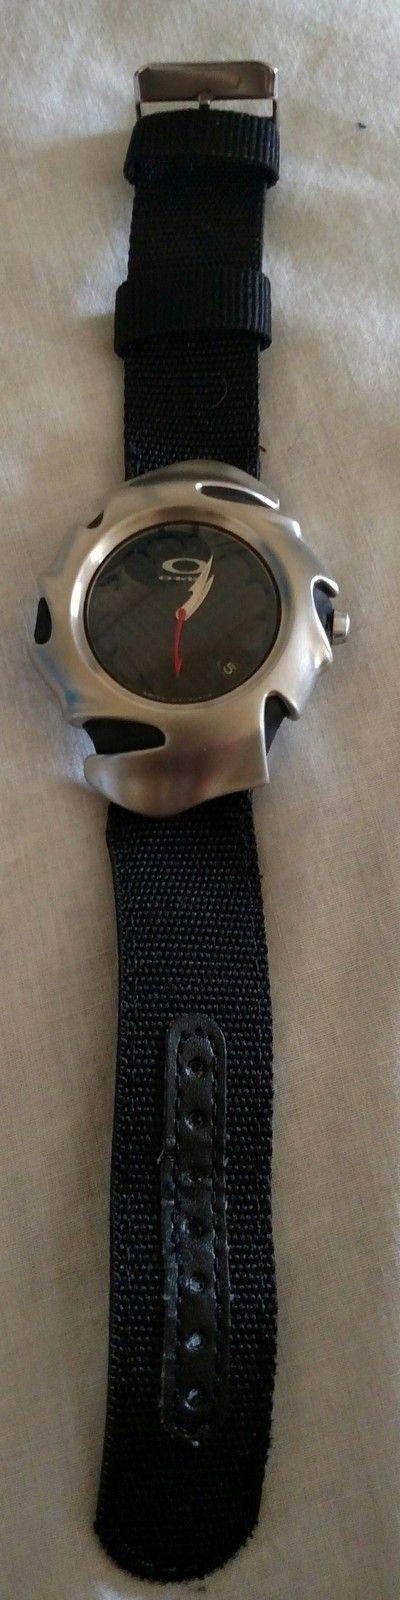 Blade Watch (PRICE DROP) - uploadfromtaptalk1428254257716.jpg